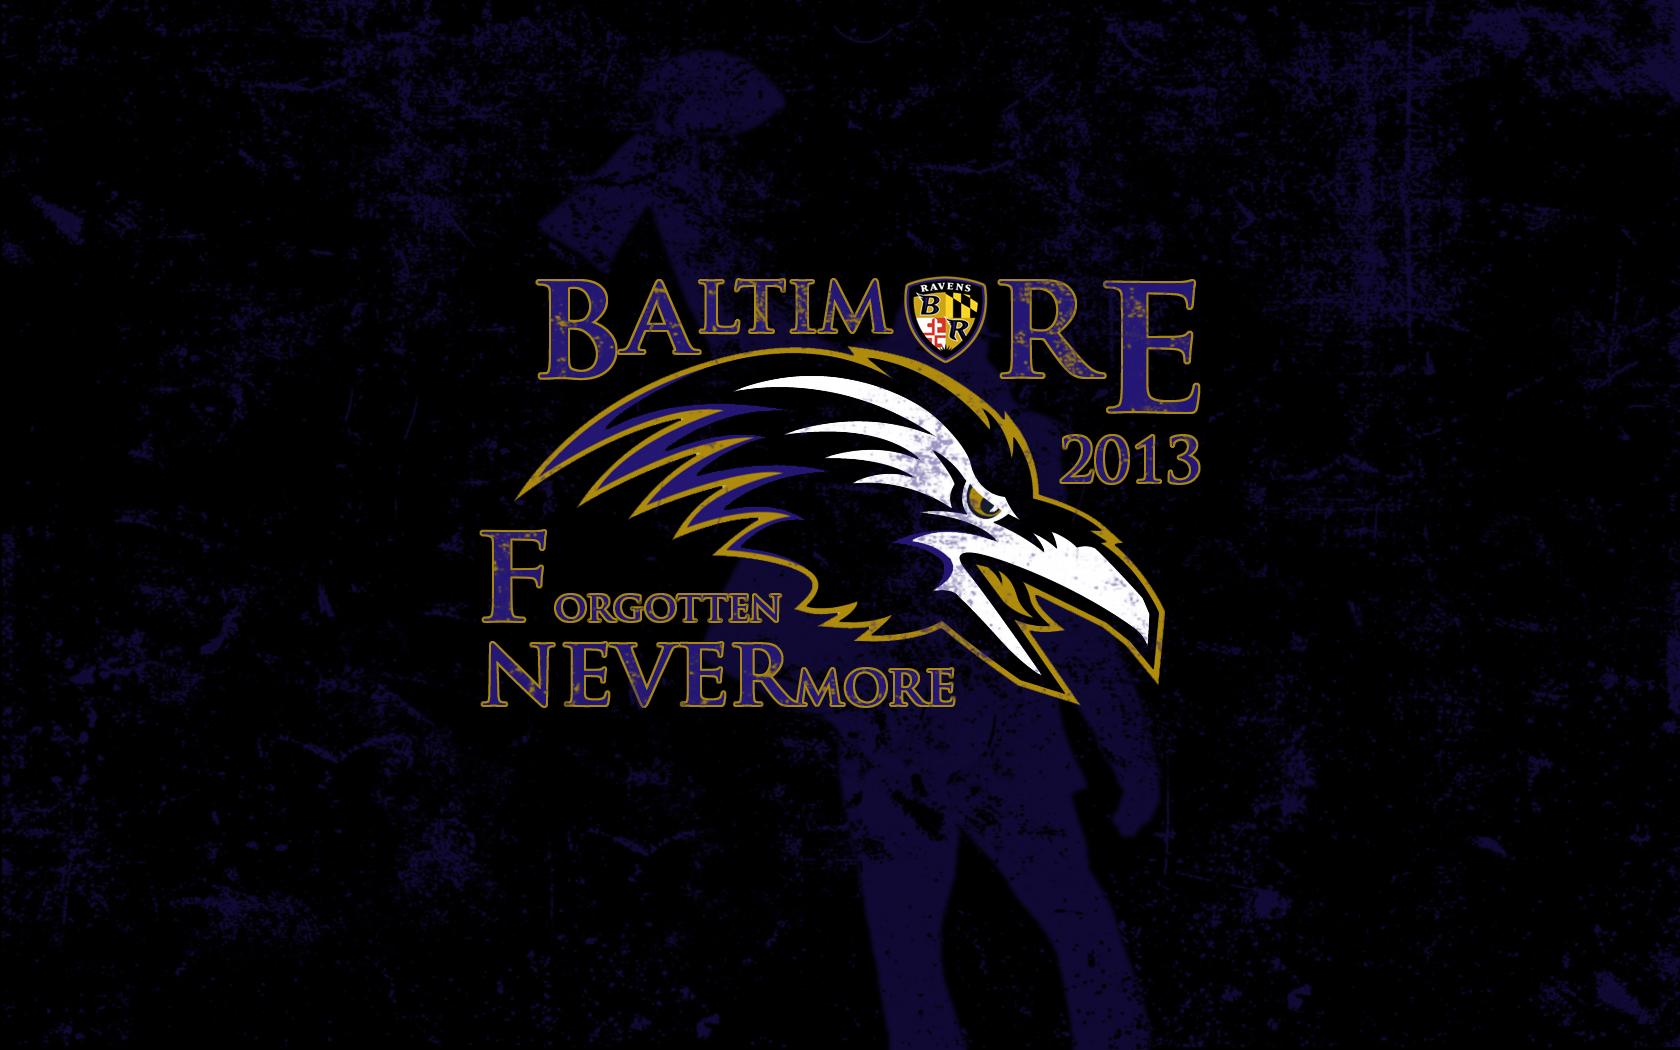 Baltimore Ravens Windows Theme 1680x1050